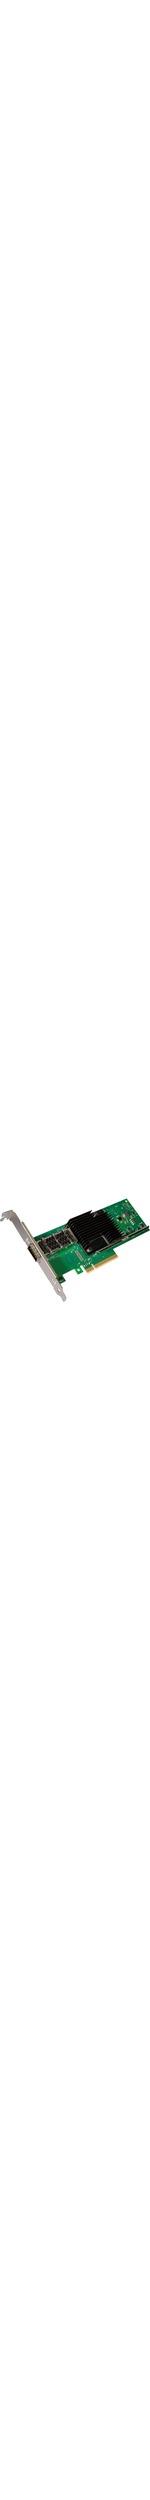 Intel 40Gigabit Ethernet Card for Server - PCI Express 3.0 x8 - 1 Ports - Optical Fiber, Twinaxial - Bulk